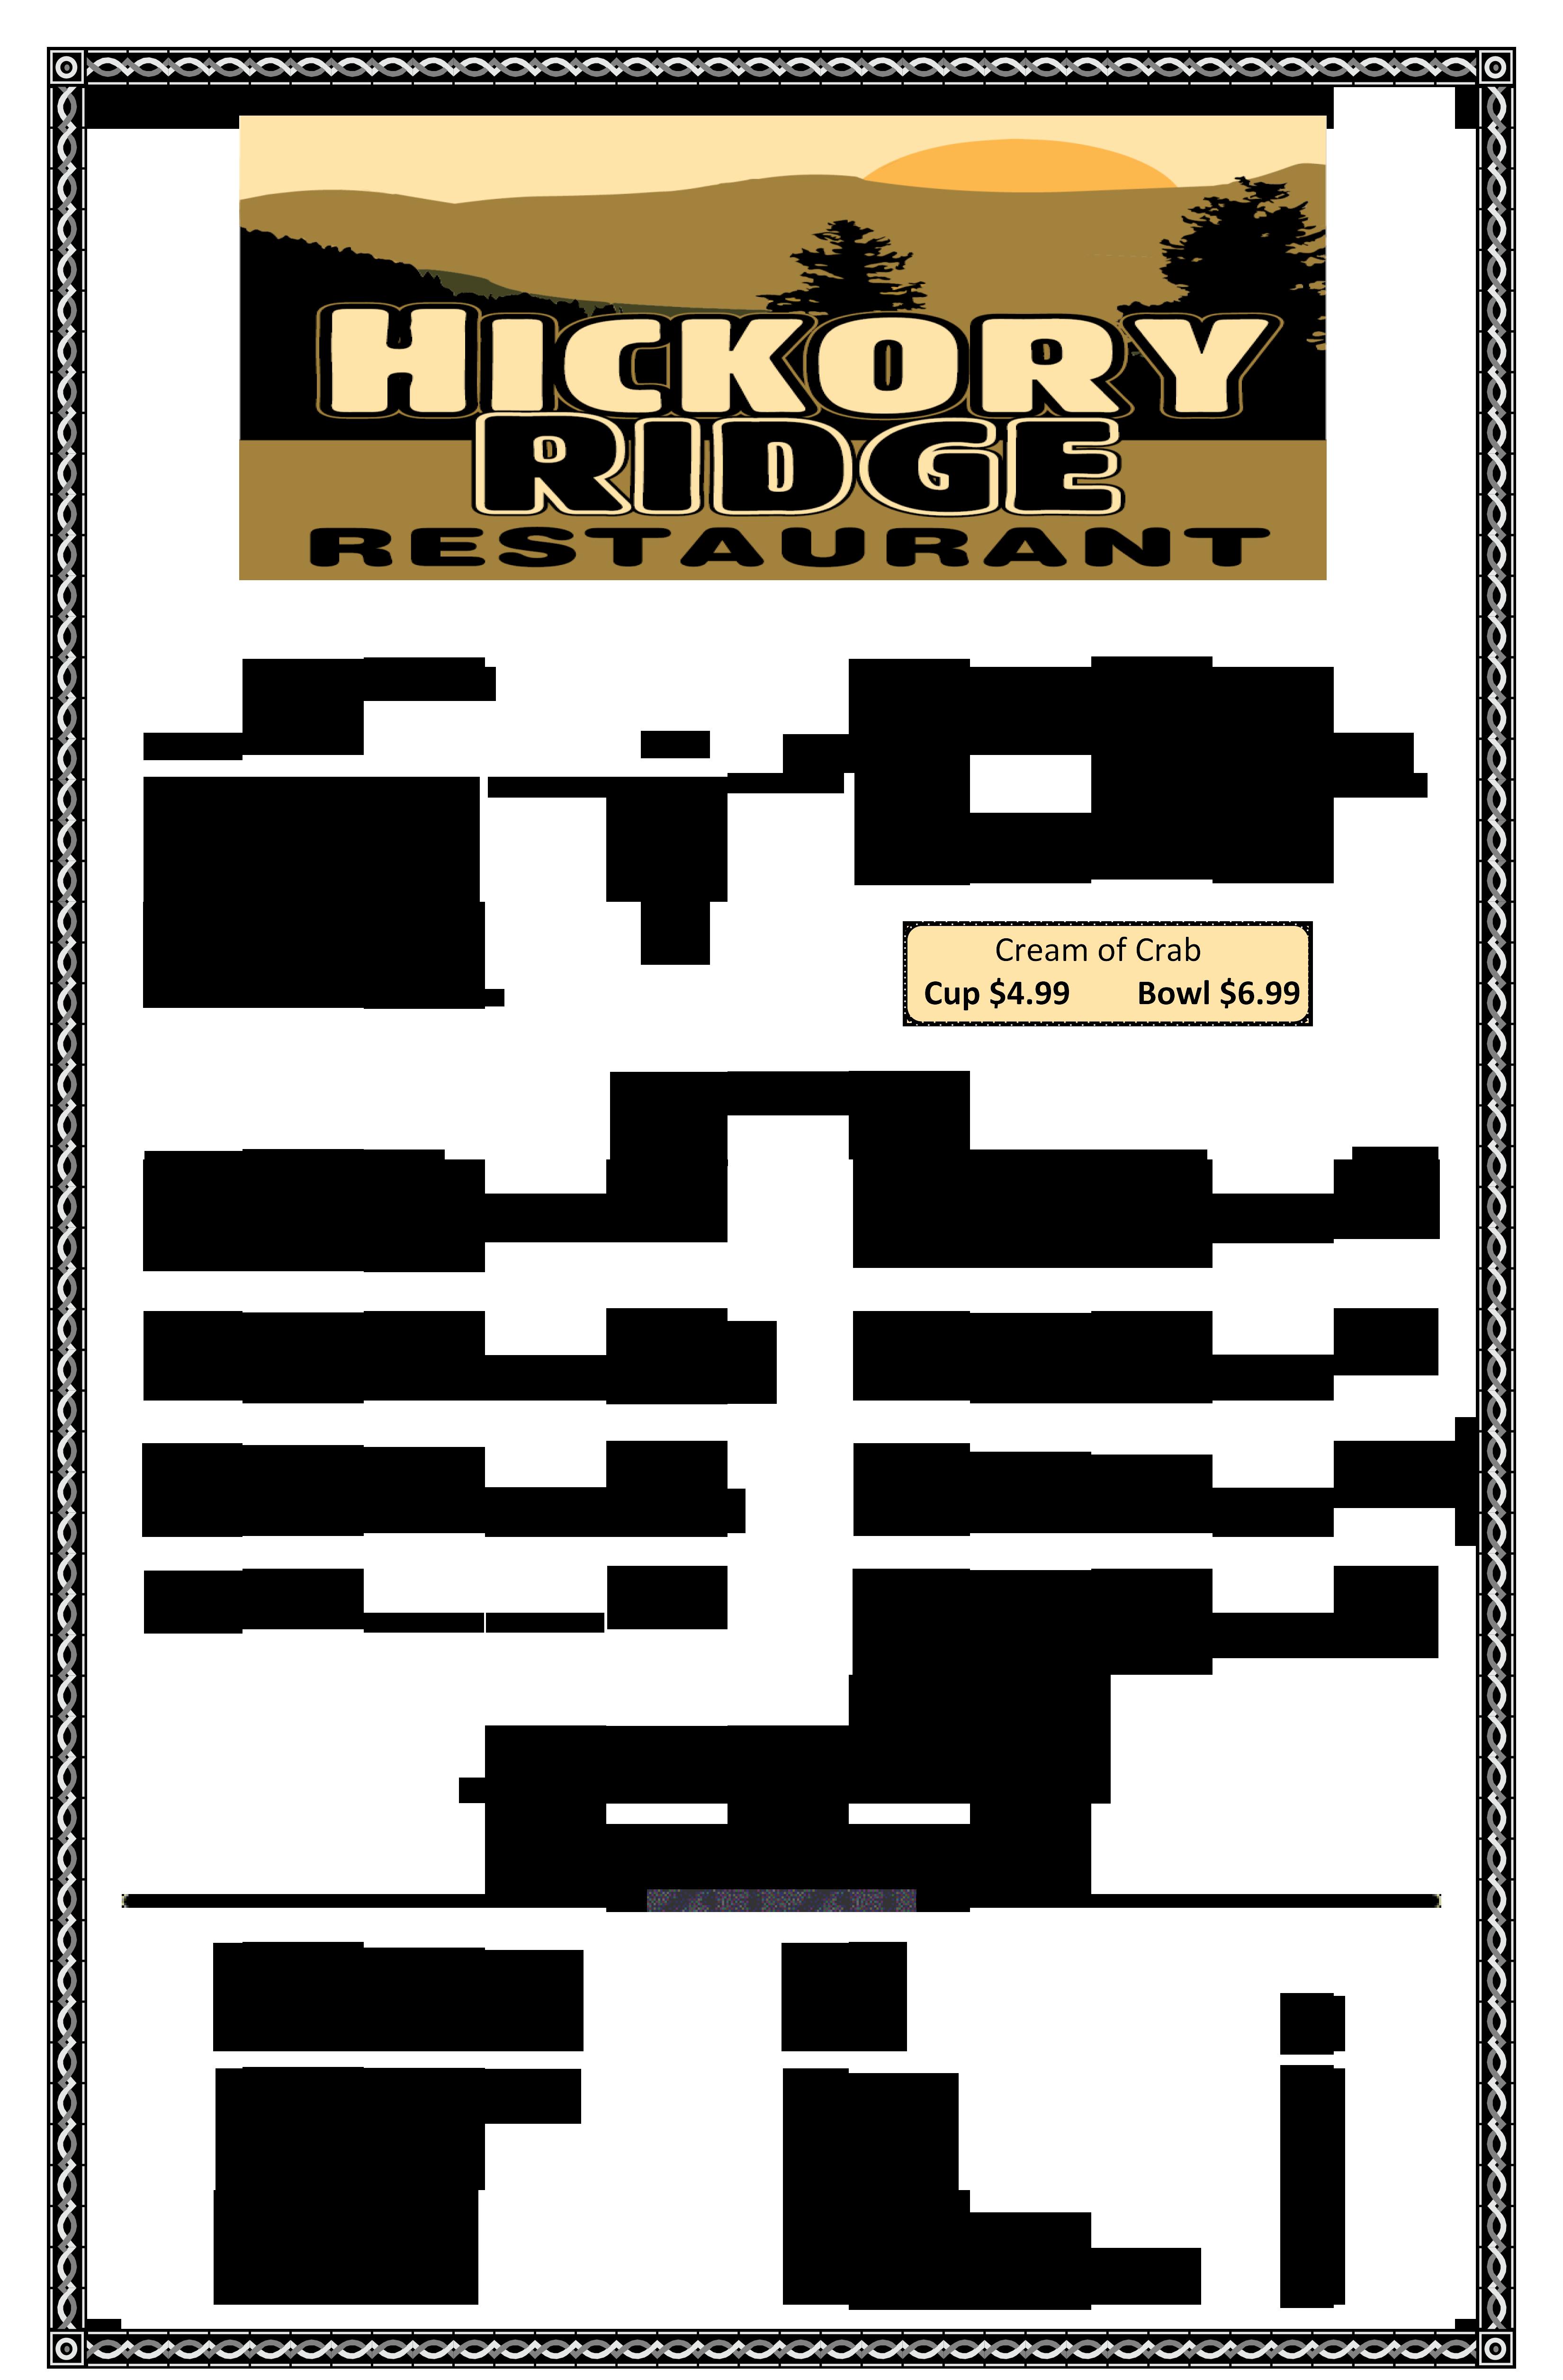 Hickory Ridge Restaurant Menu